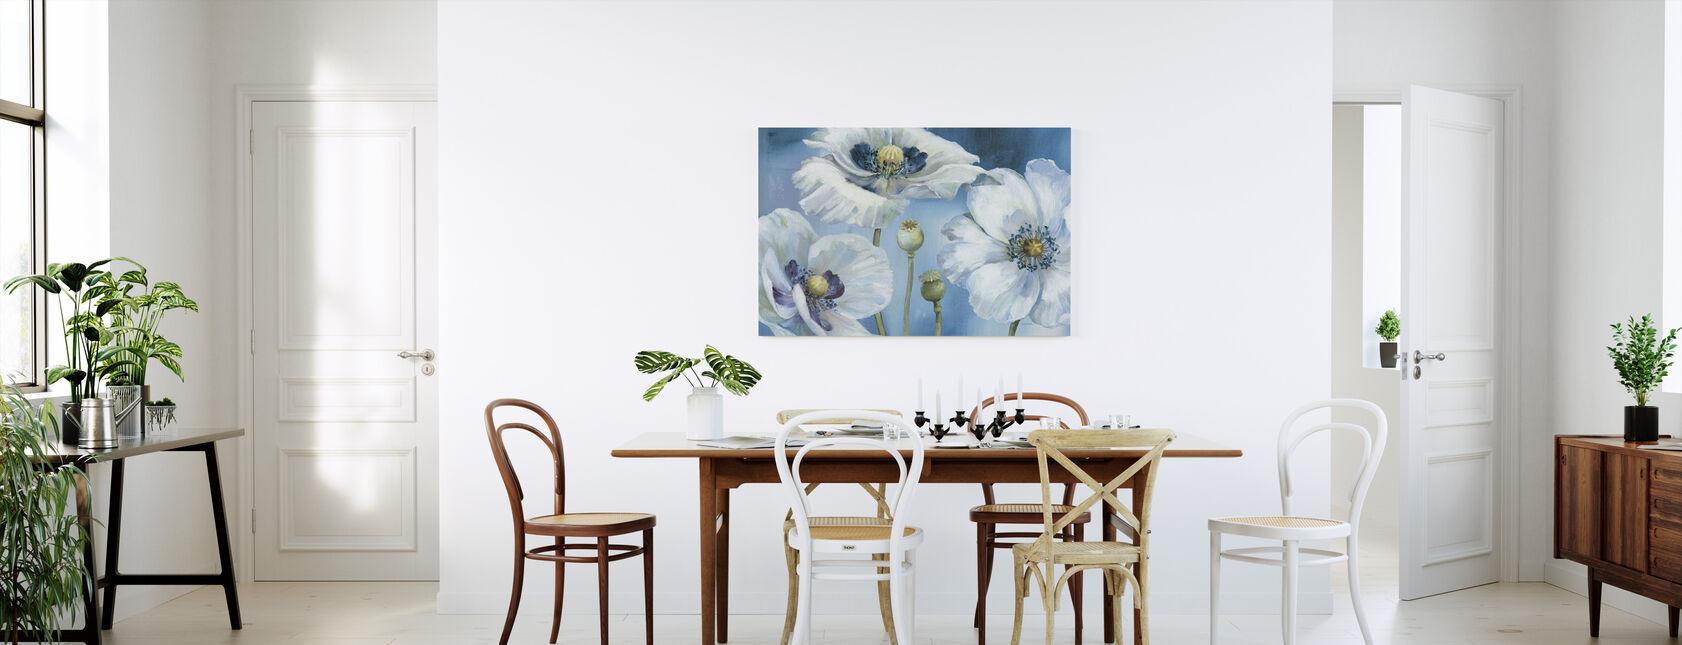 Blauwe Dans - Canvas print - Keuken